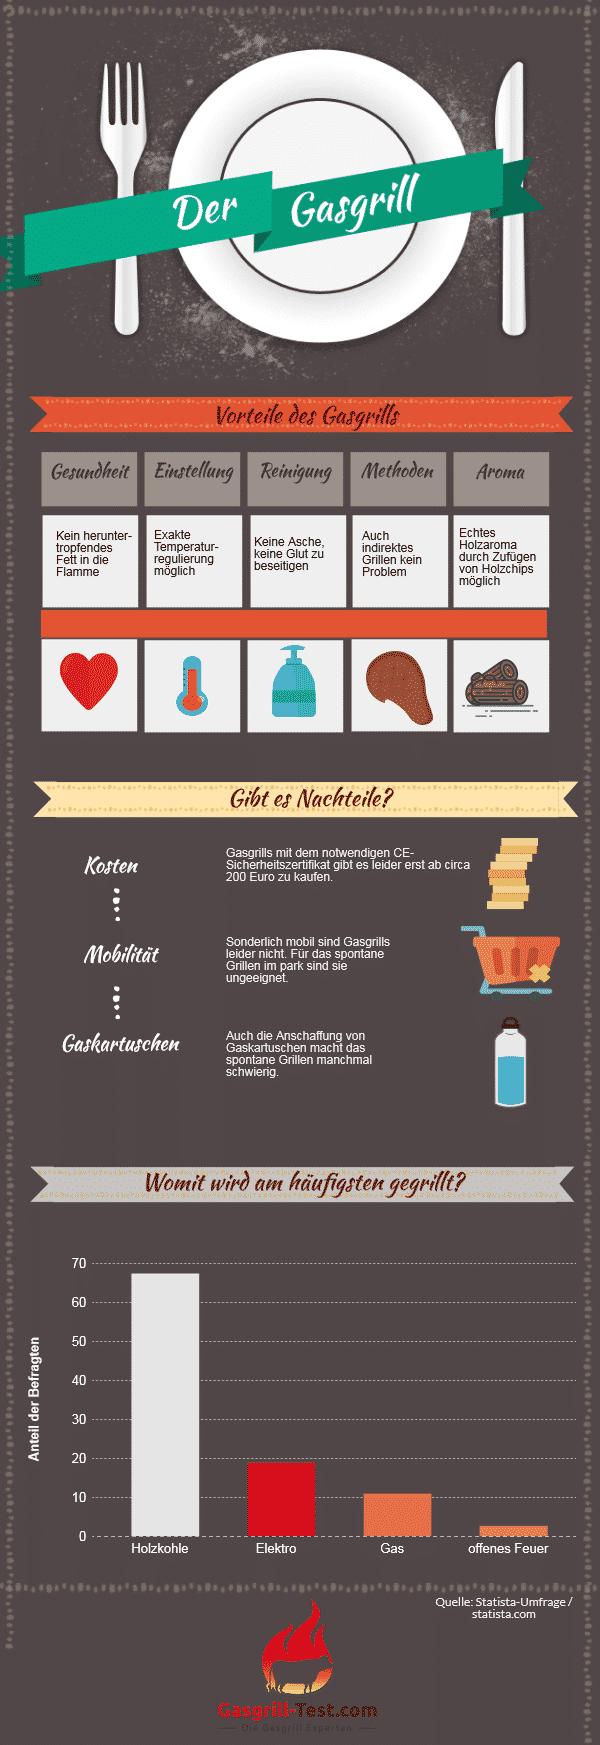 Infografik über den Gasgrill